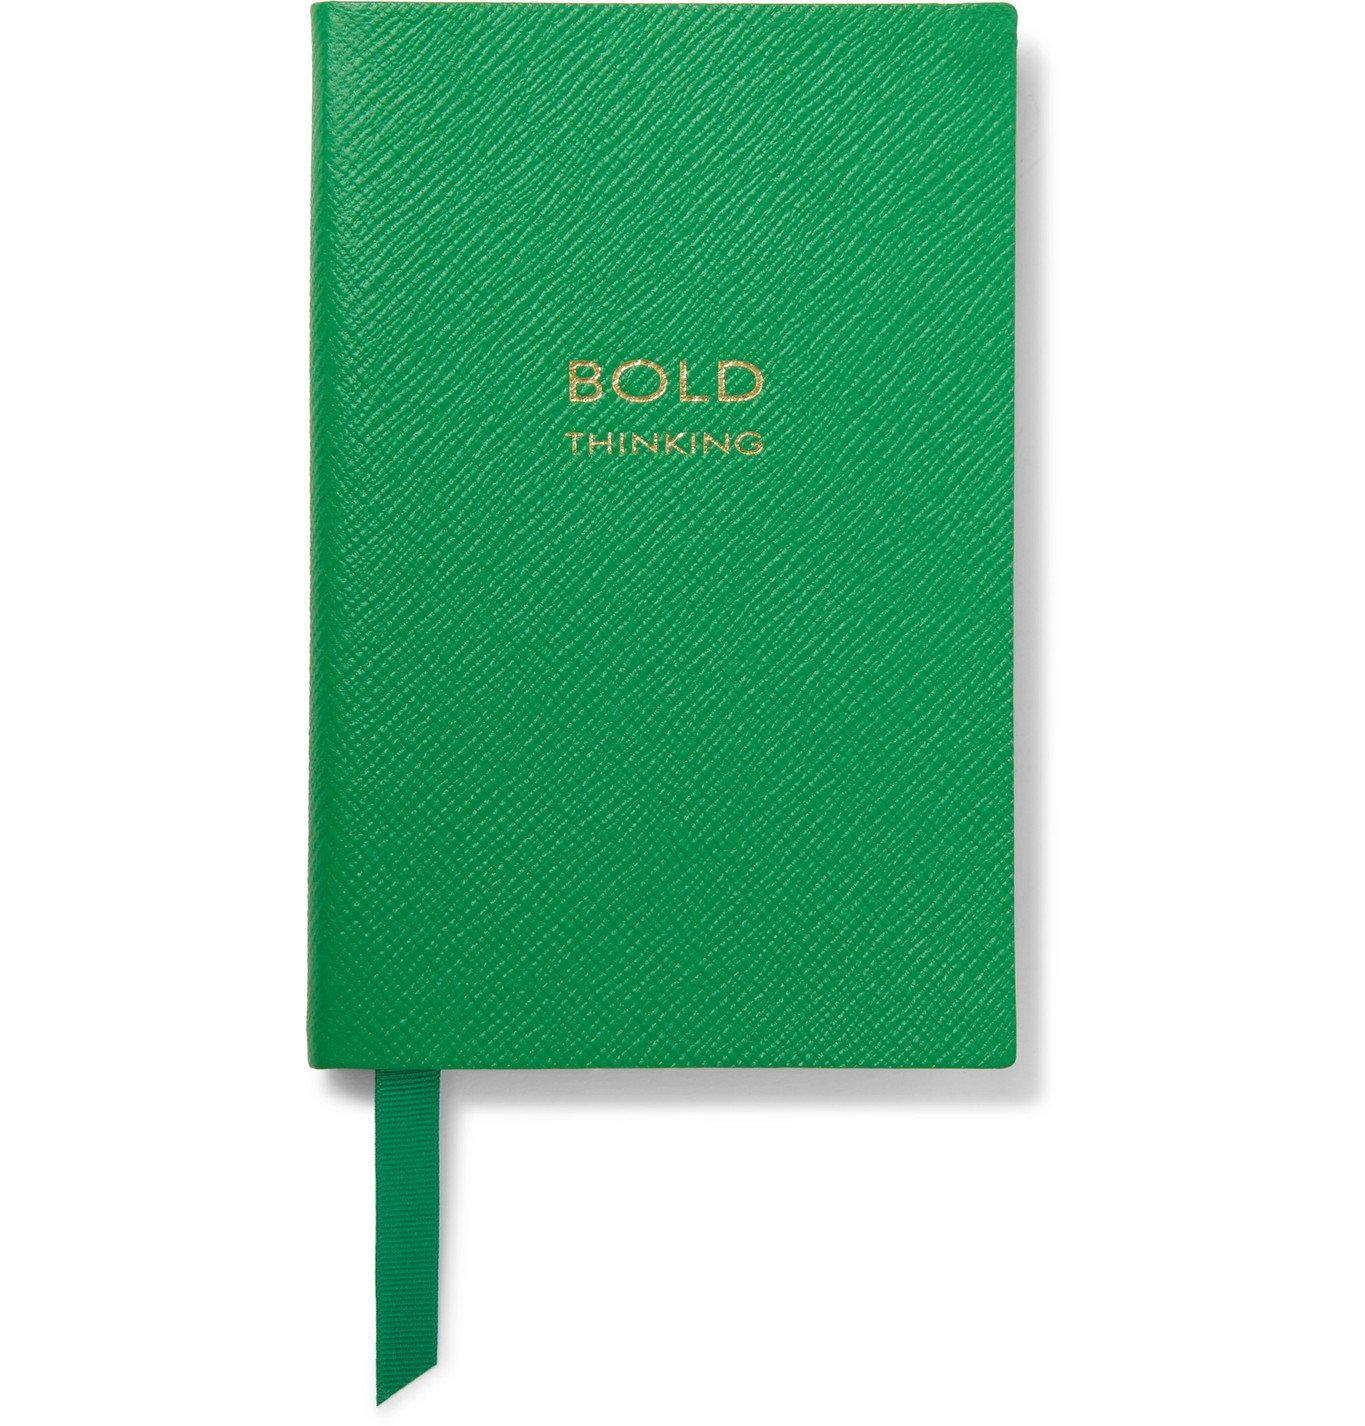 Smythson - Bold Thinking Chelsea Cross-Grain Leather Notebook - Green